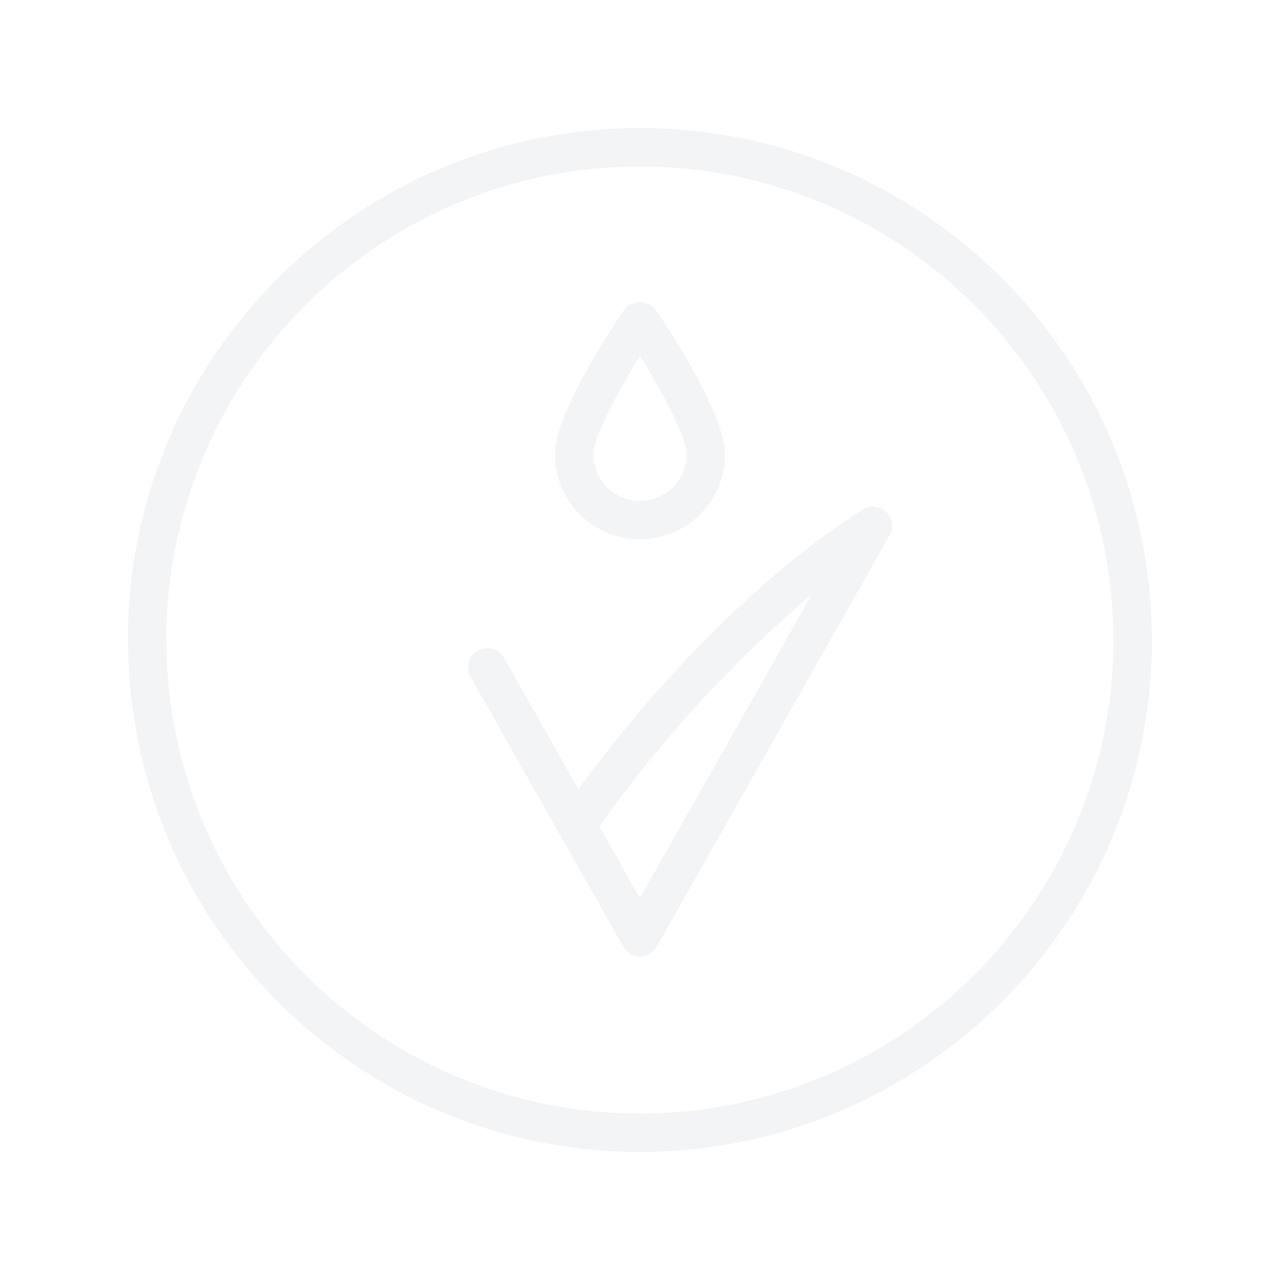 JANE IREDALE Retractable Eyebrow Pencil 0.09g